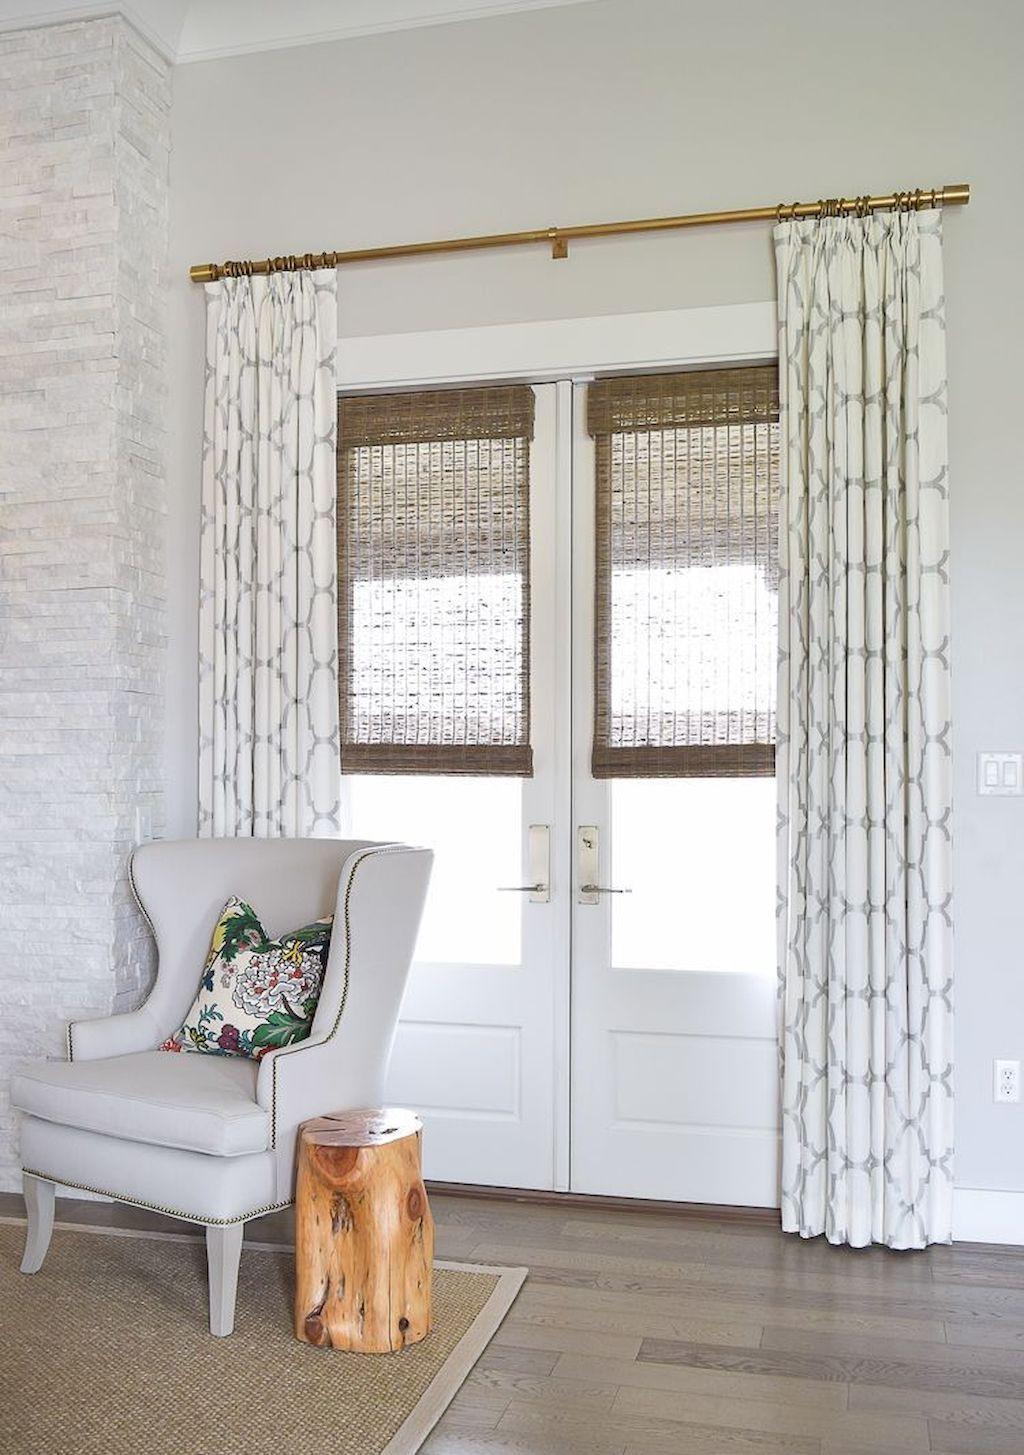 73 Modern Farmhouse Curtains for Living Room Decorating ... on Farmhouse Curtain Ideas For Living Room  id=68798